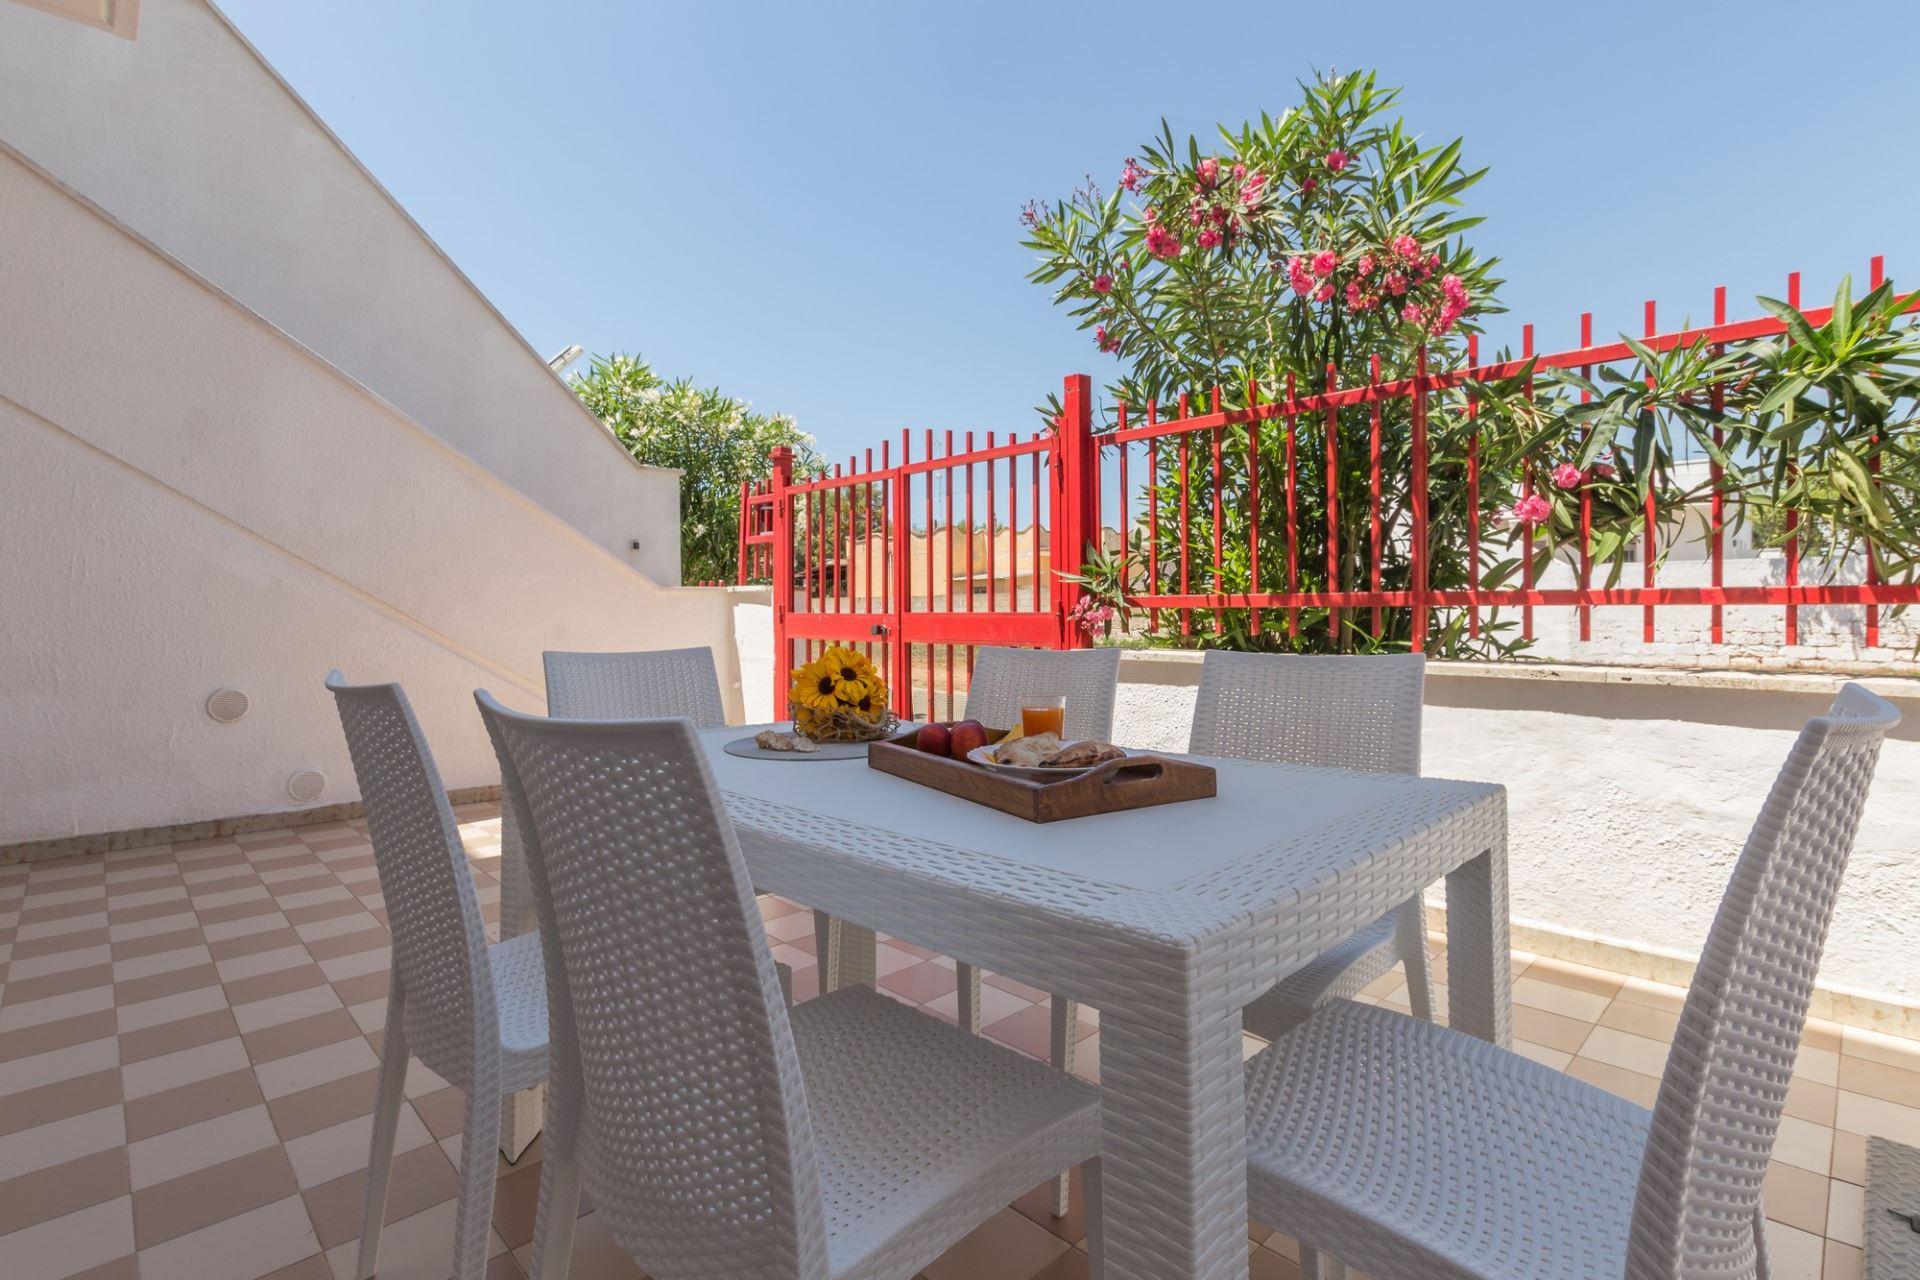 Casa Gaia, appartamento vacanze con spazio esterno